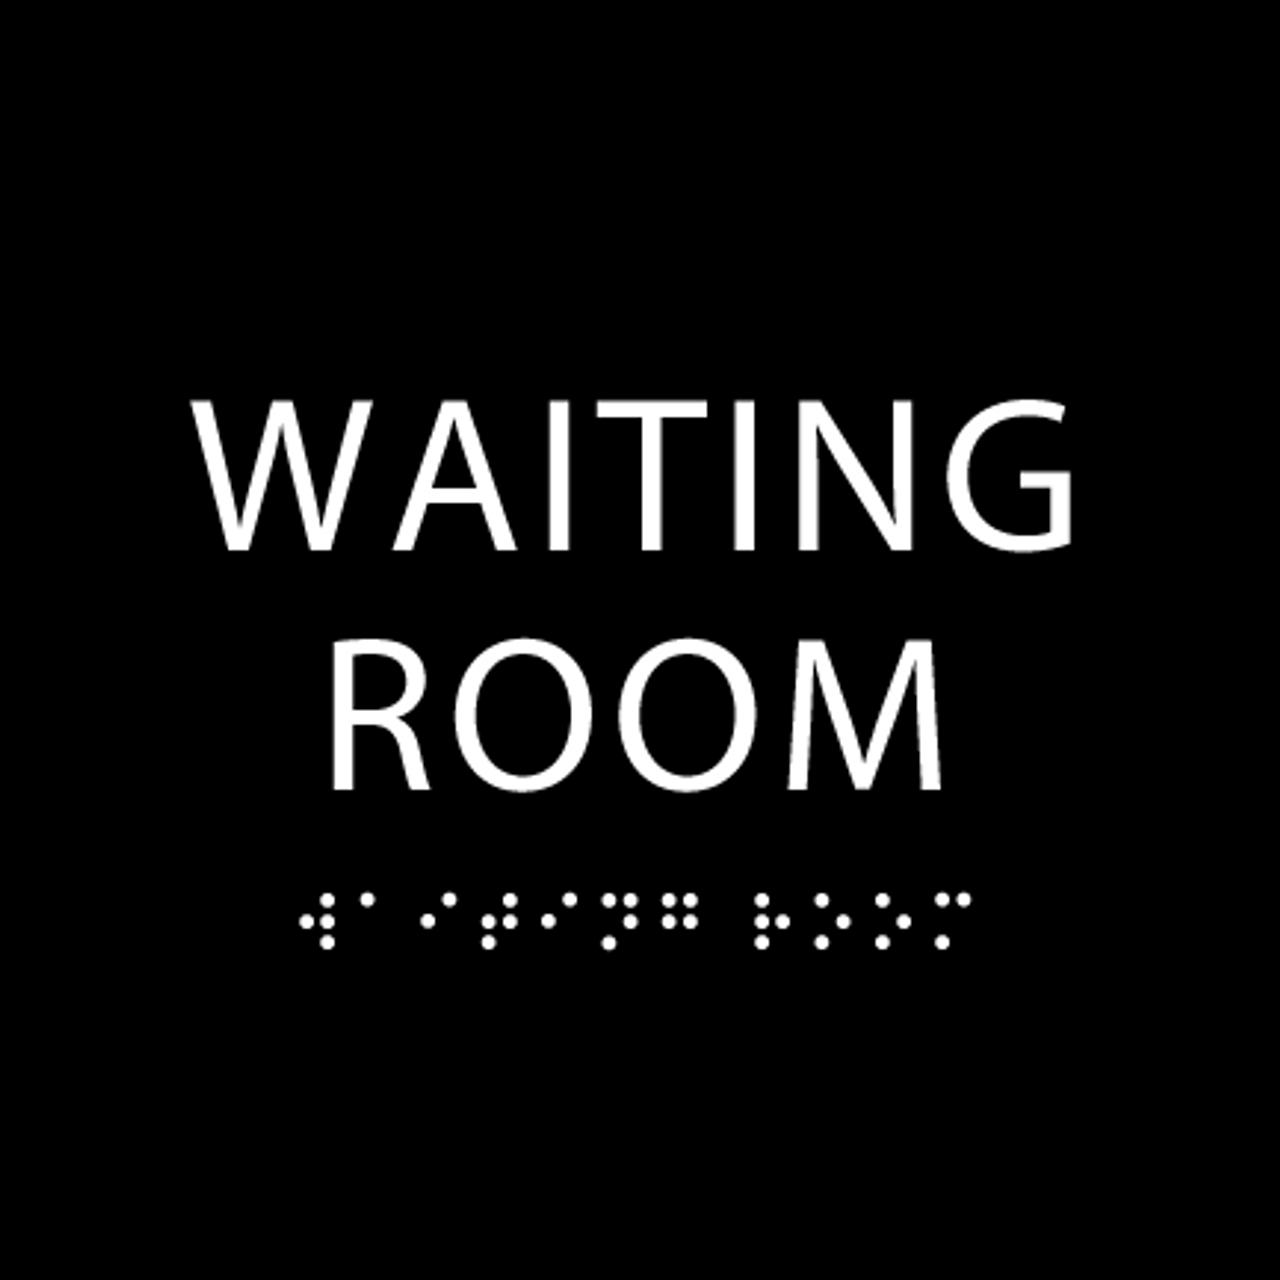 Black Waiting Room ADA Sign